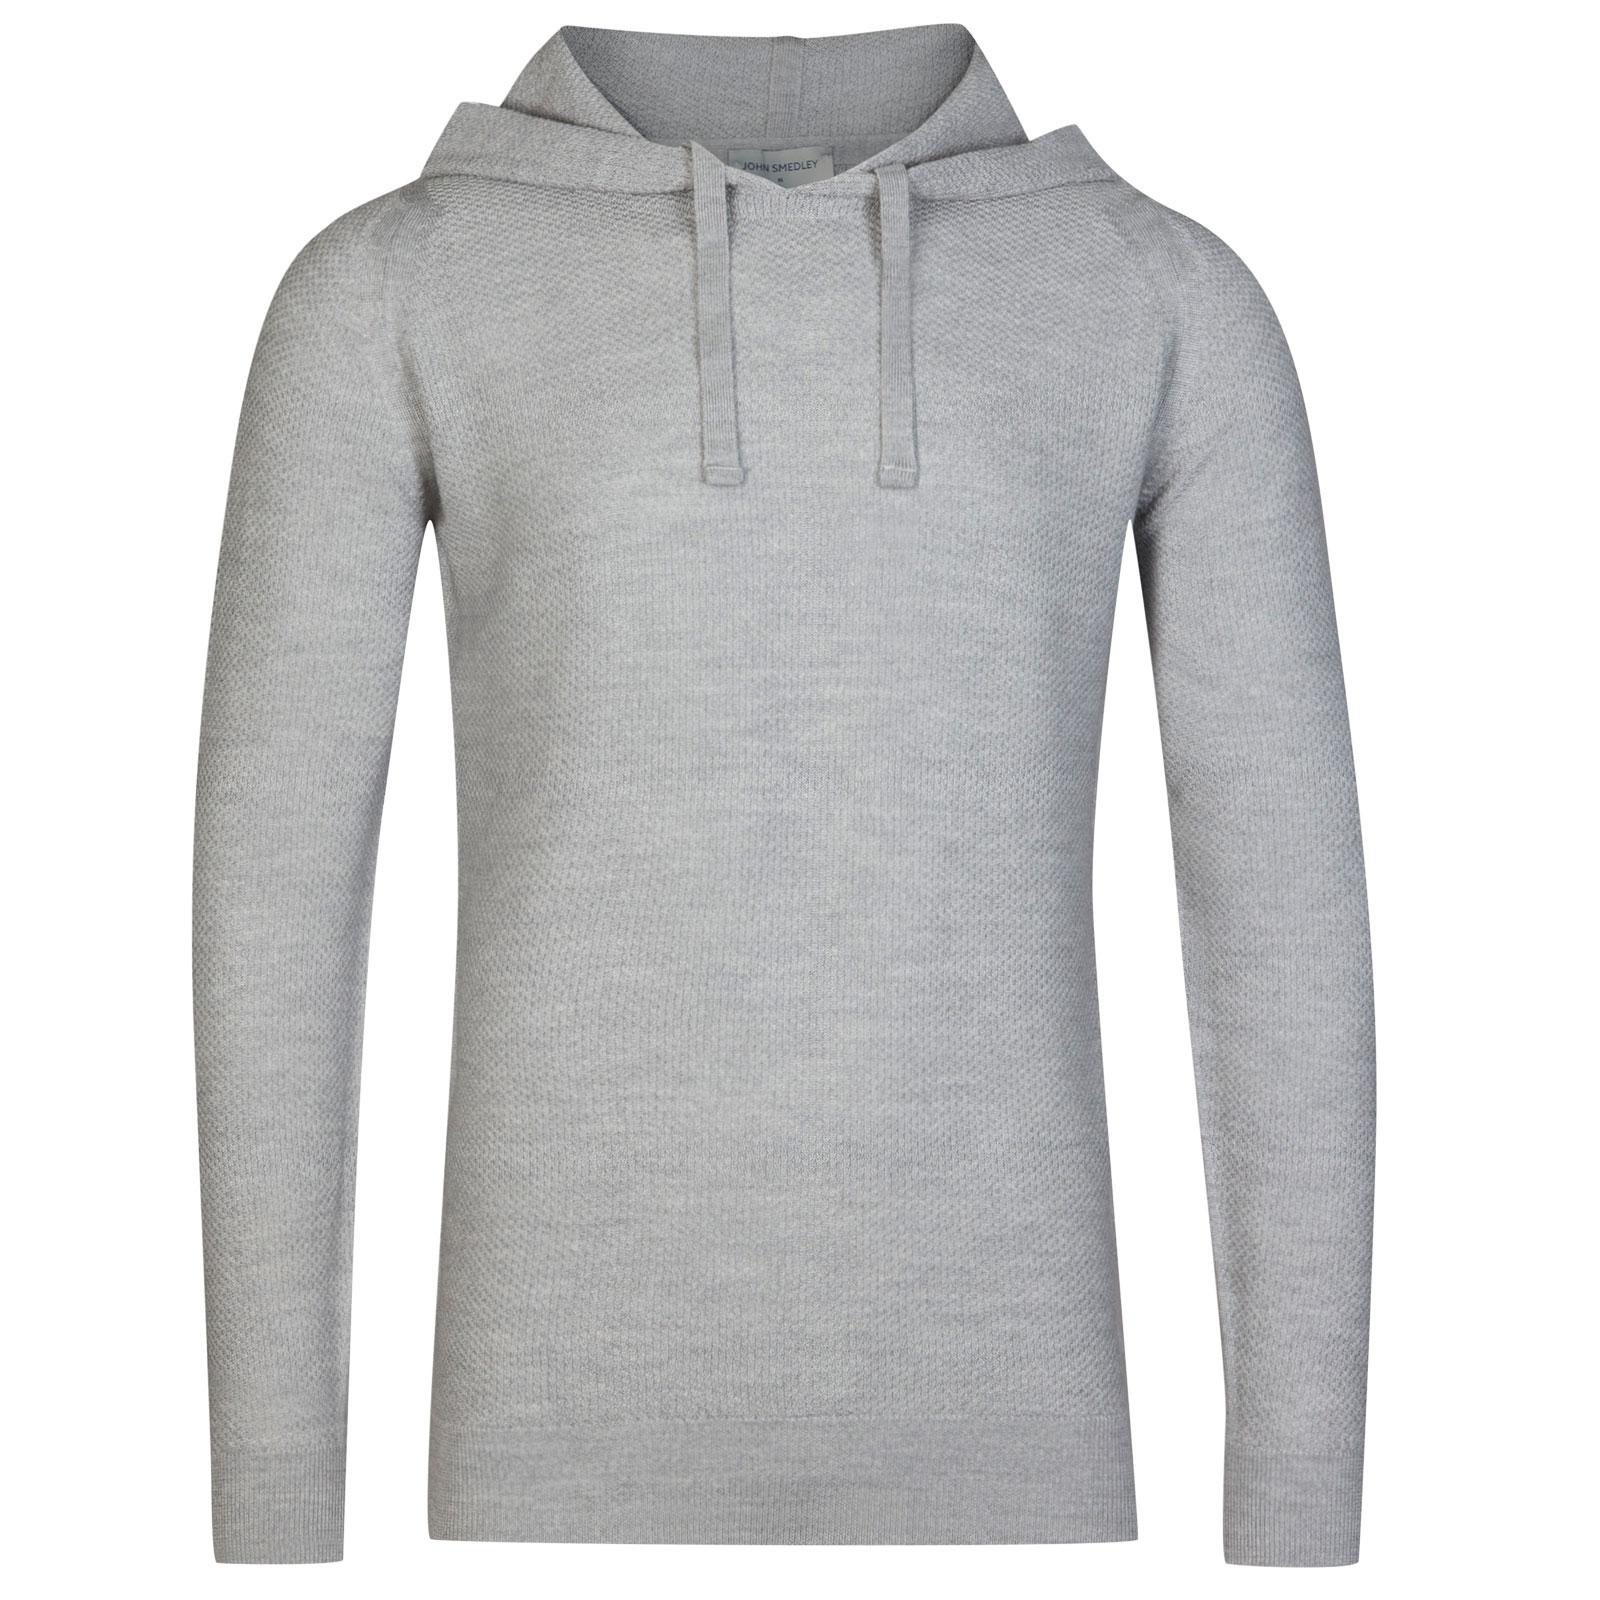 John Smedley 4Singular Merino Wool Pullover in Bardot Grey-XL